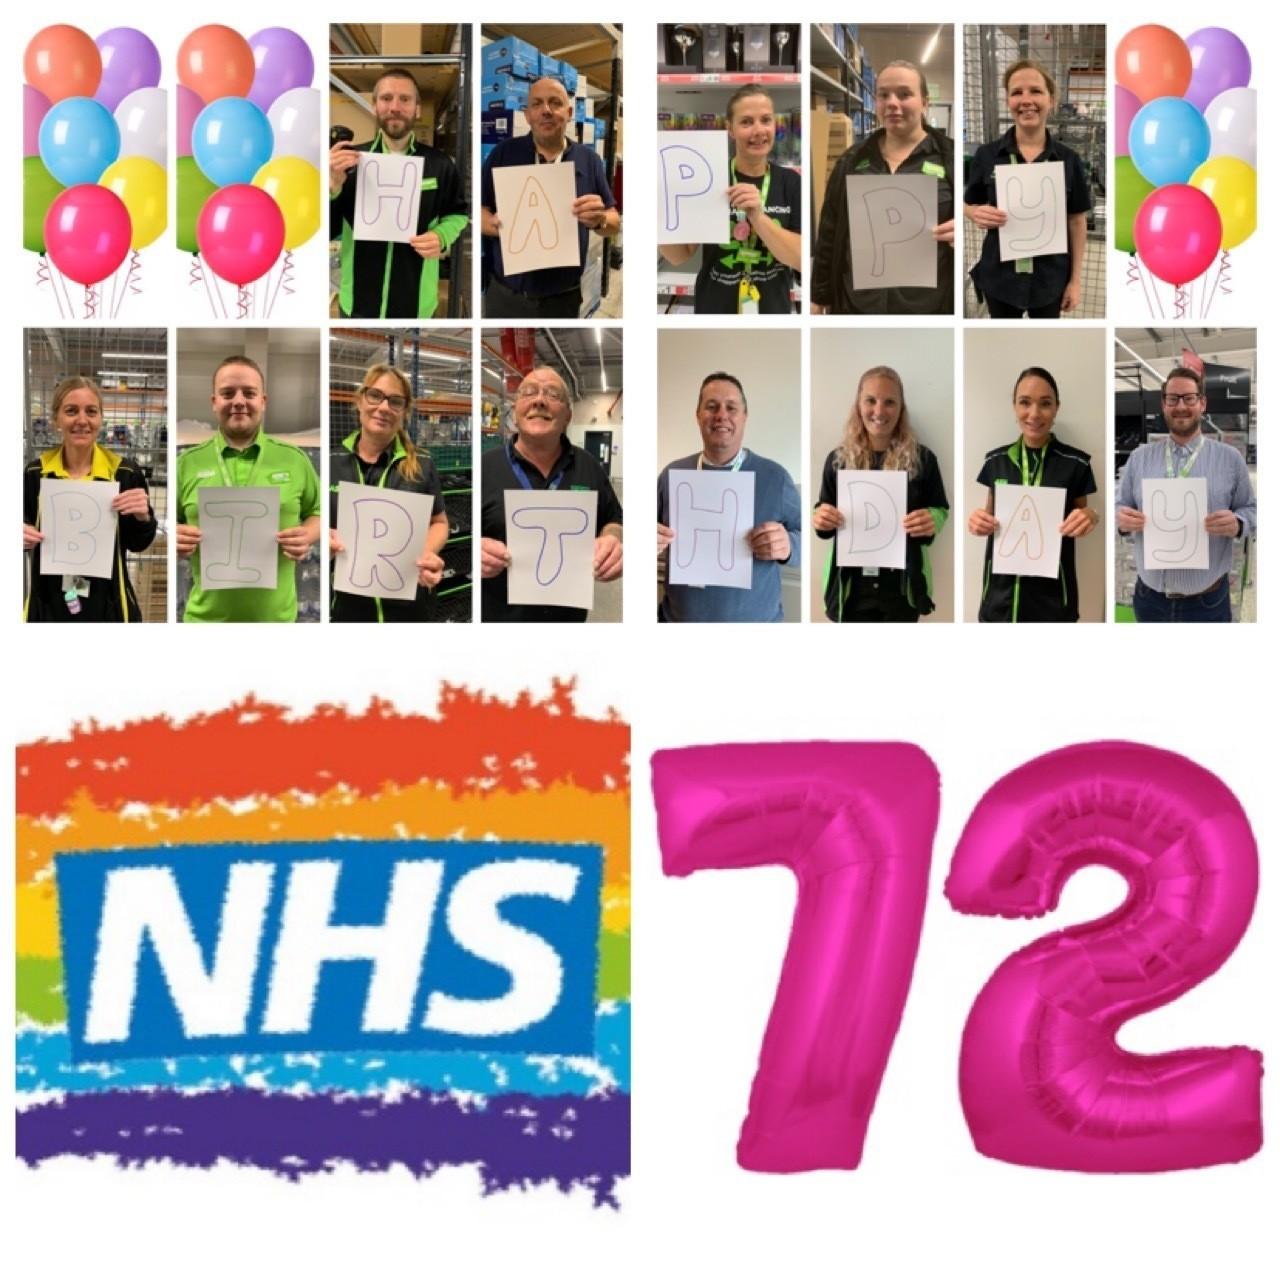 Happy birthday NHS | Asda Clacton-on-Sea